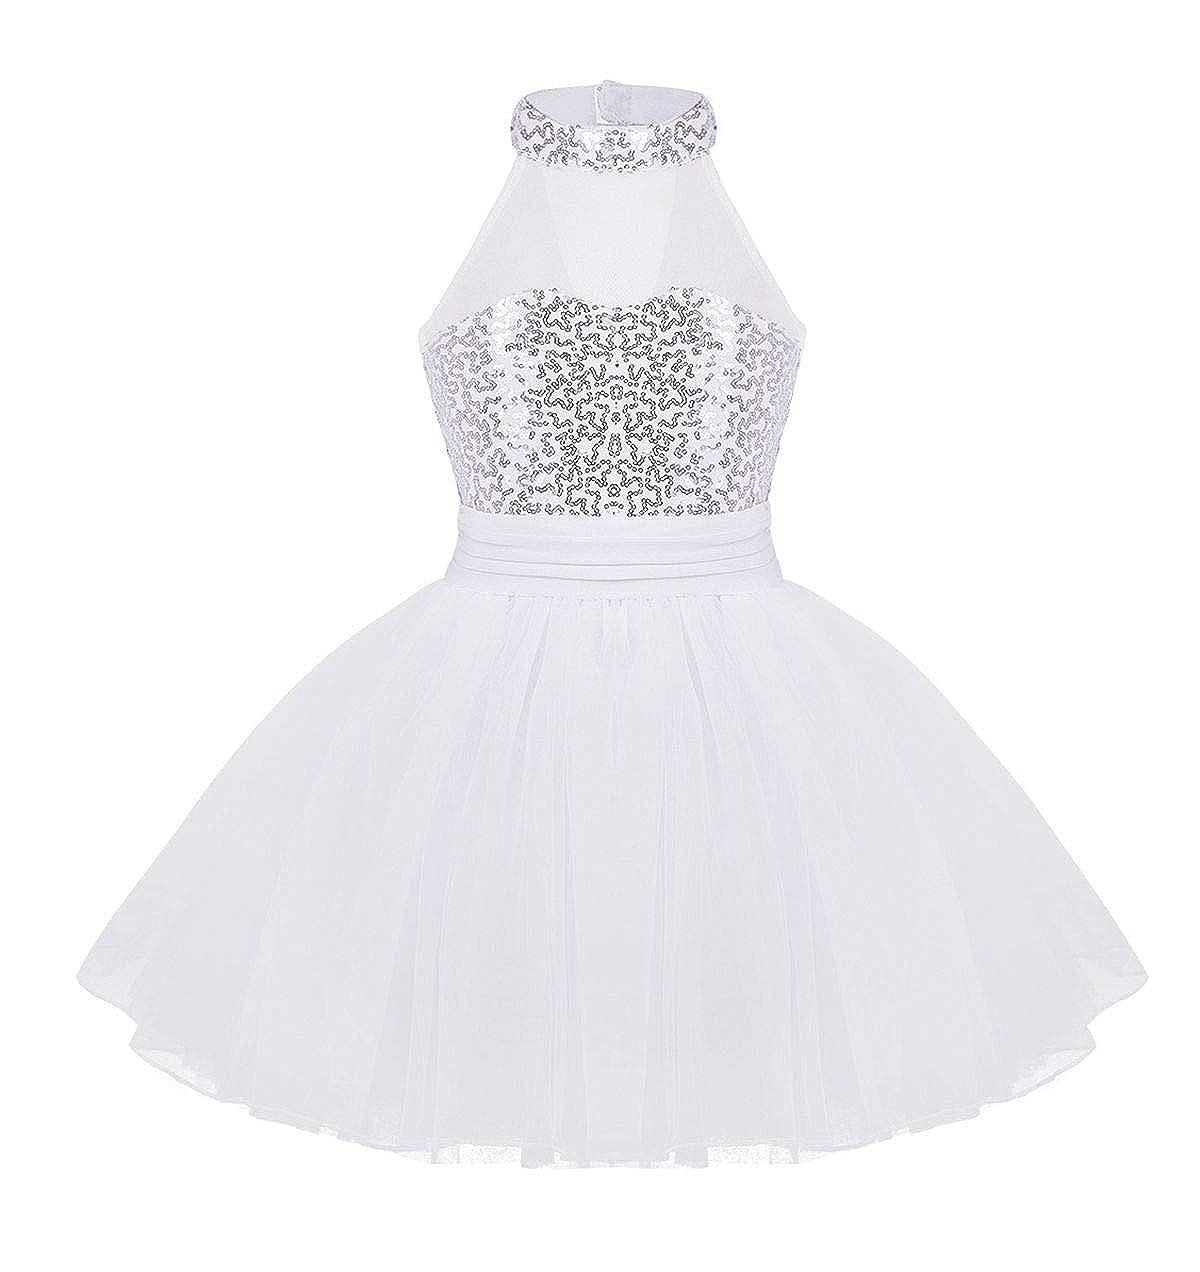 CHICTRY Girls Kids Sequins Ballet Dance Dress Gymnastics Tutu Leotard Clothes